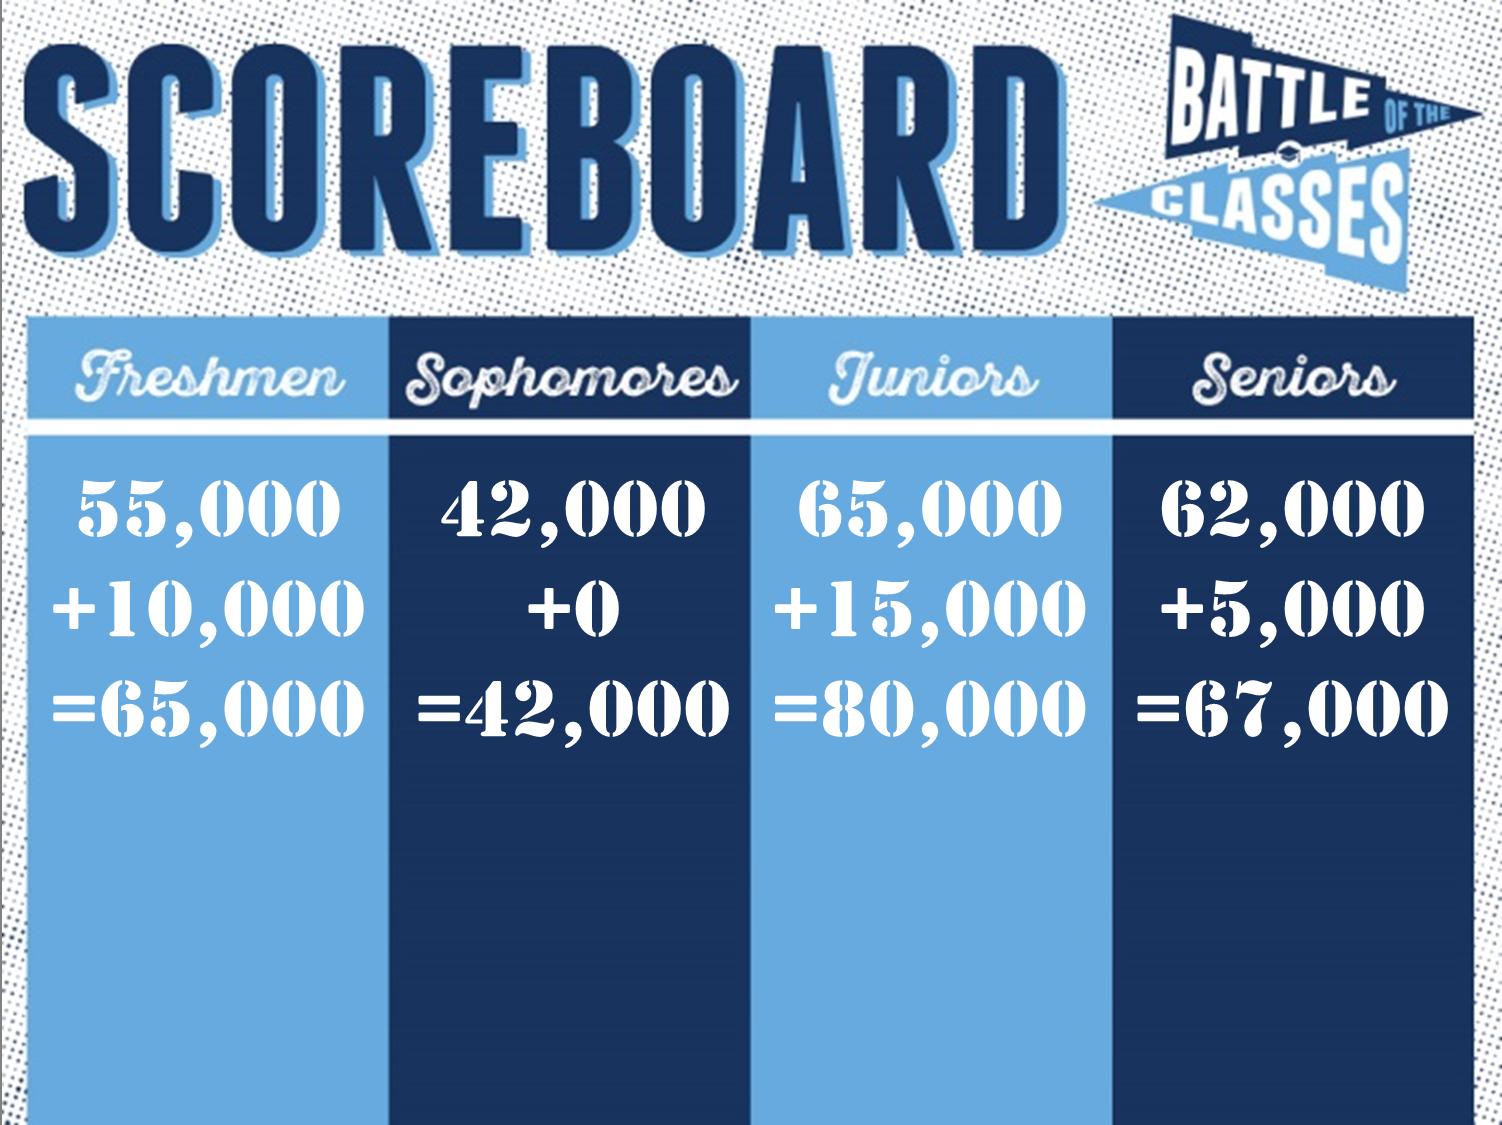 botc-scoreboard